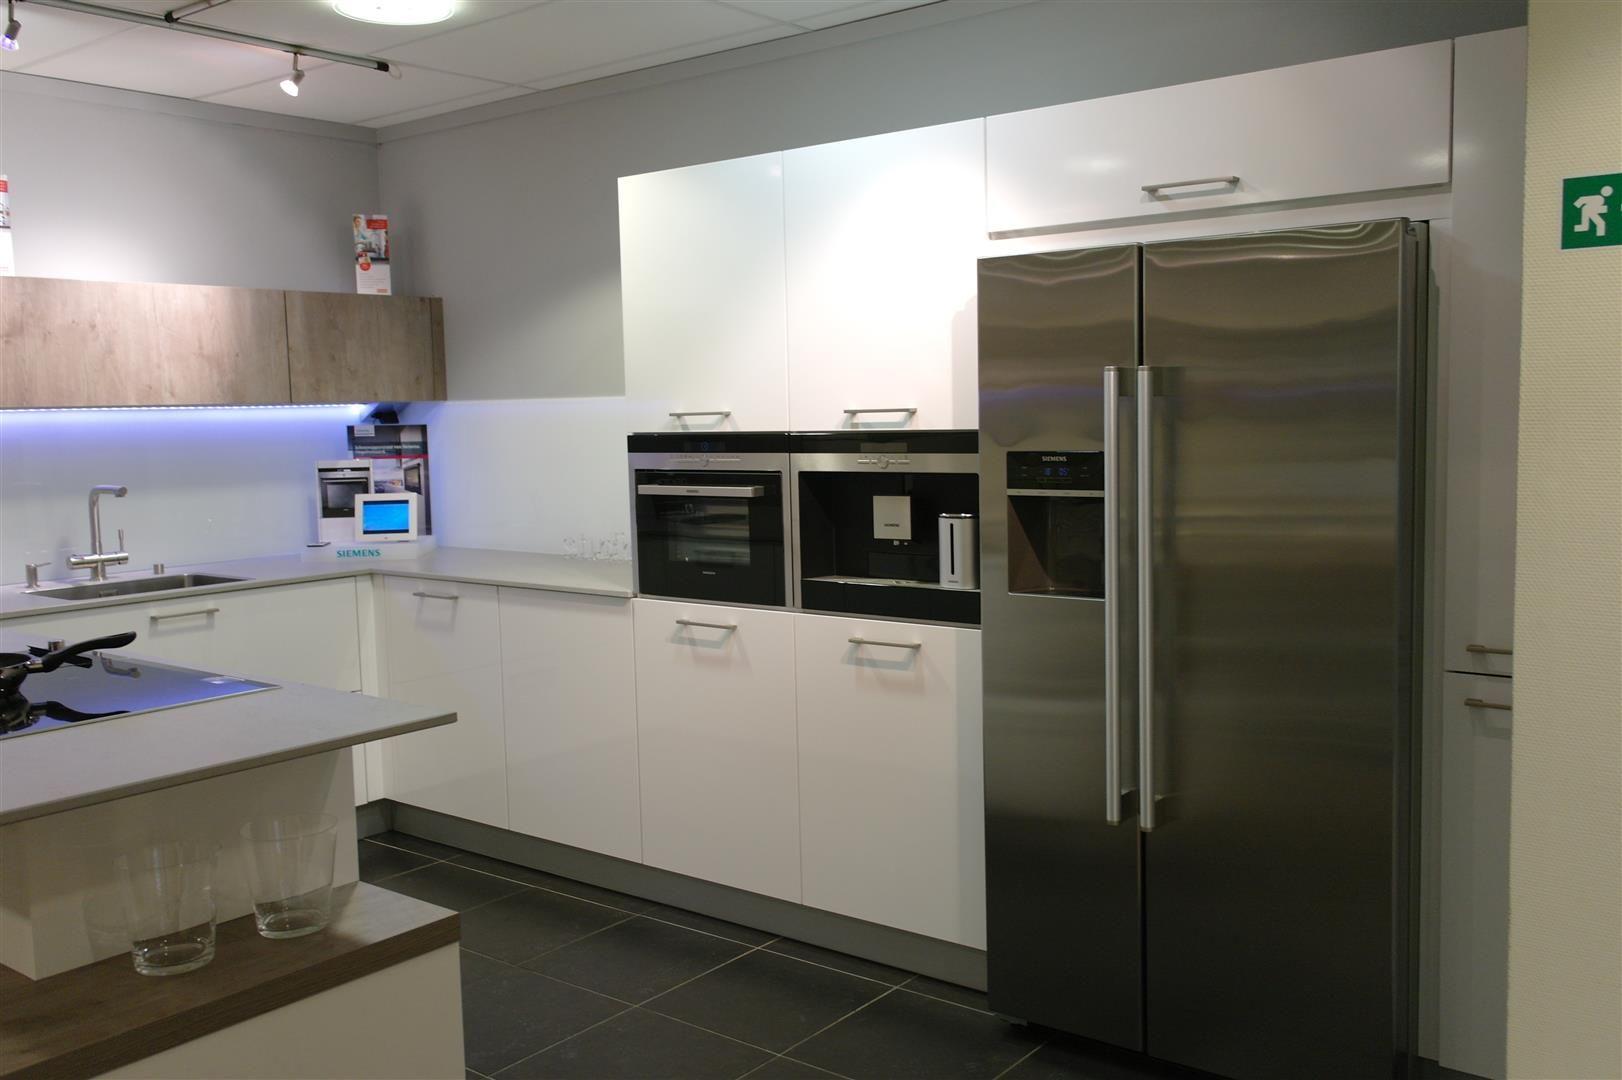 Amerikaanse Keuken Apparatuur : Showroomkorting.nl De voordeligste woonwinkel van Nederland